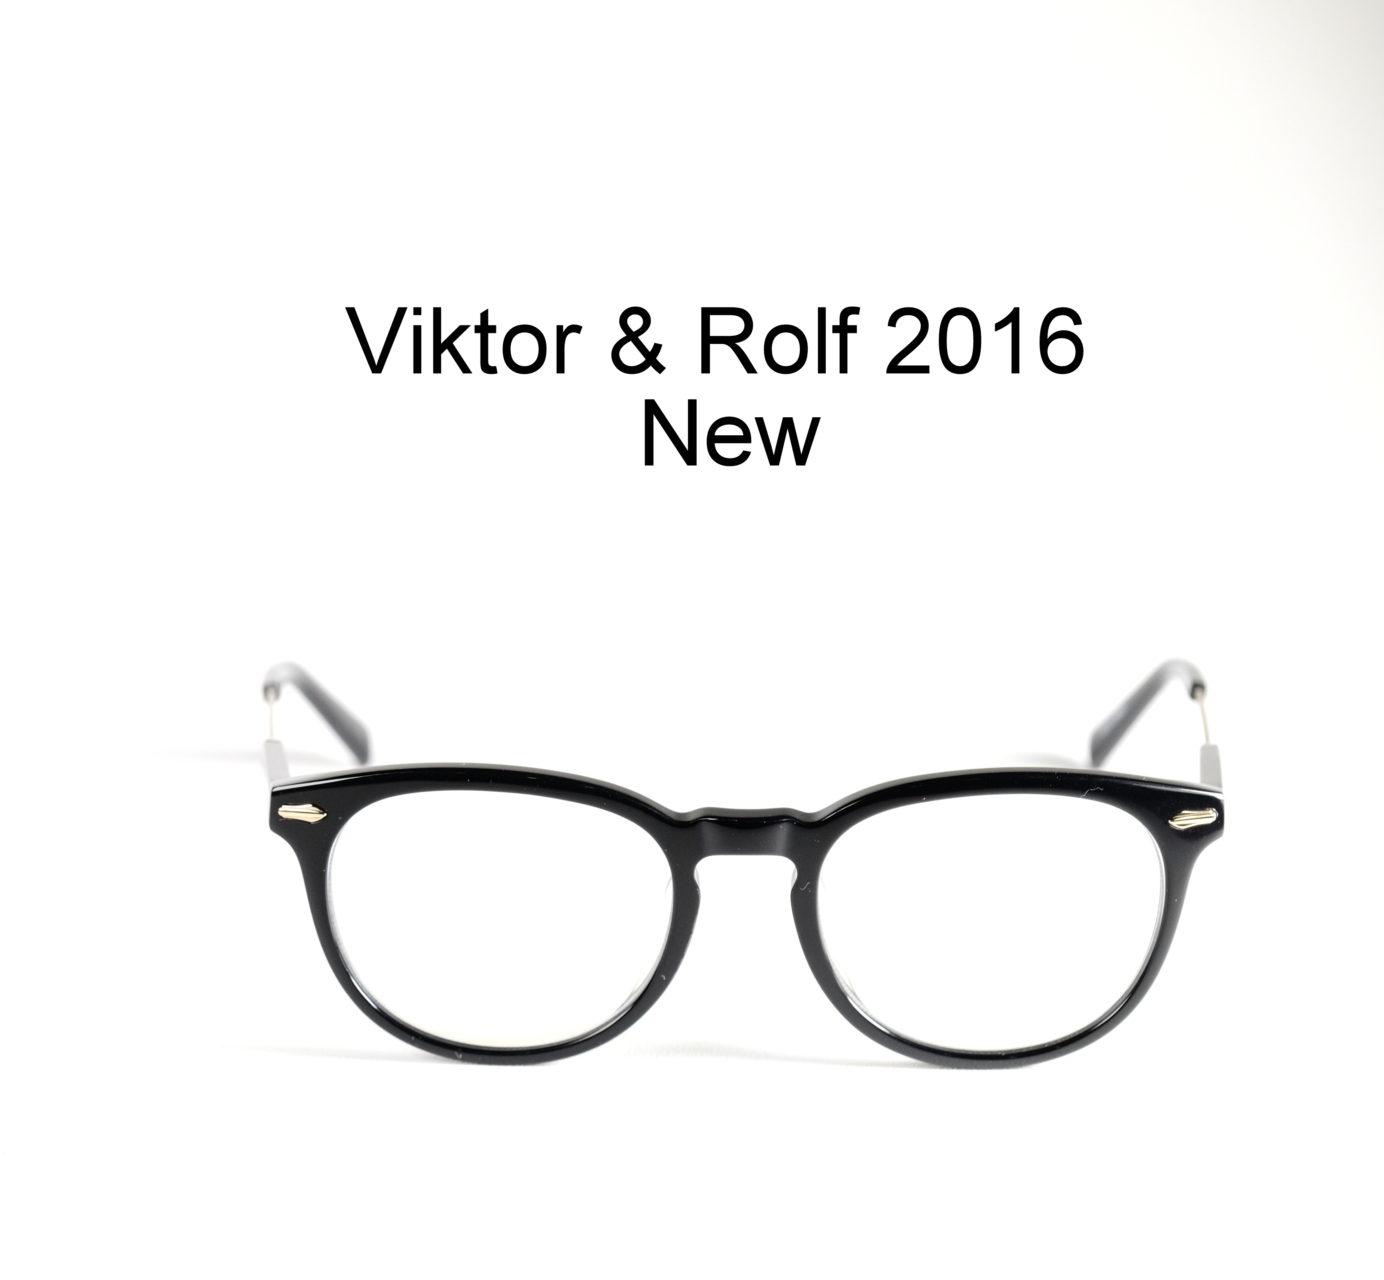 d8f992c7c8 Viktor   rolf Eyewear New Collection 2016 - Evershine Optical